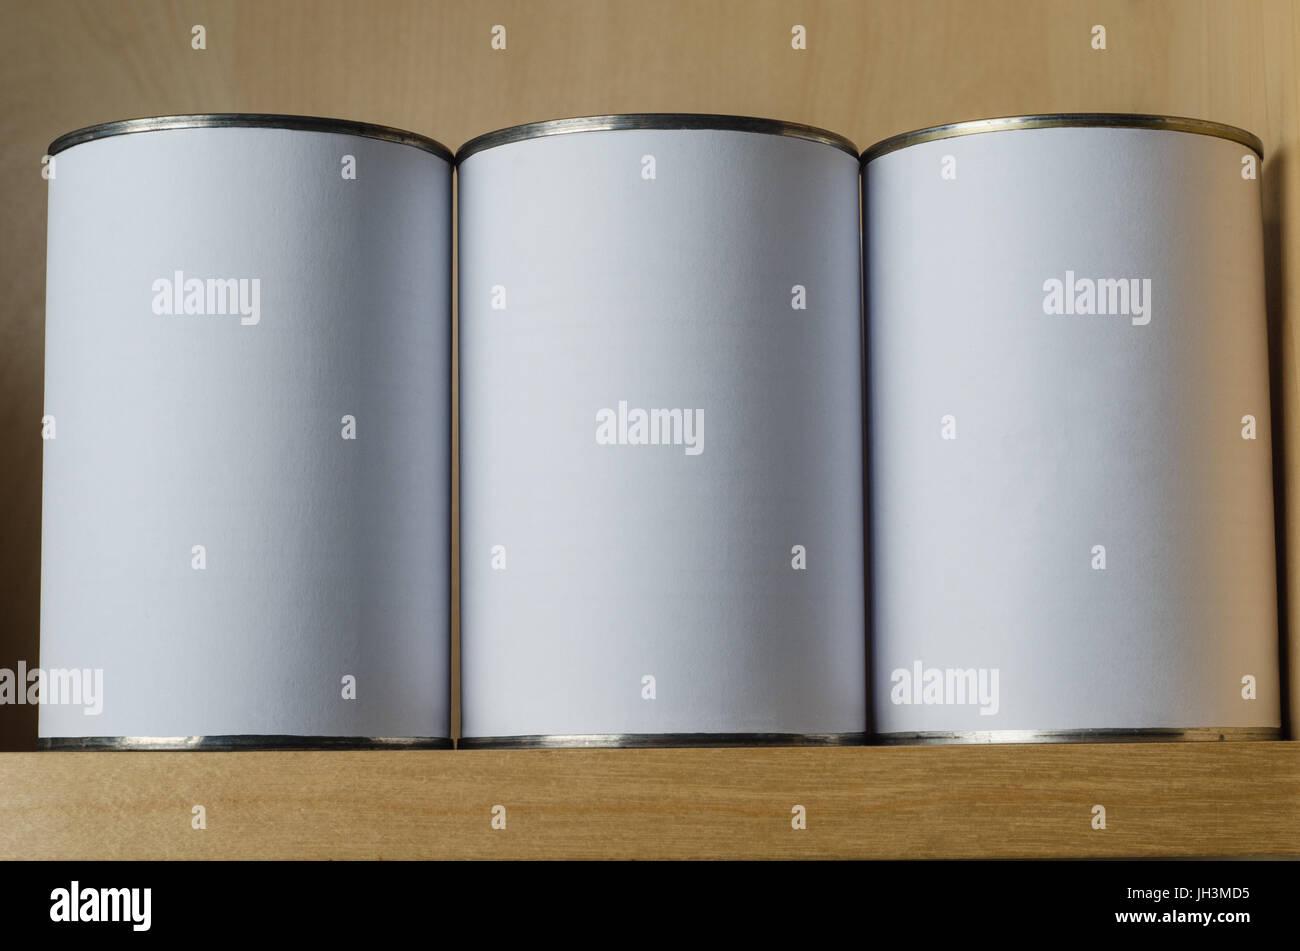 tins shelf stockfotos tins shelf bilder alamy. Black Bedroom Furniture Sets. Home Design Ideas